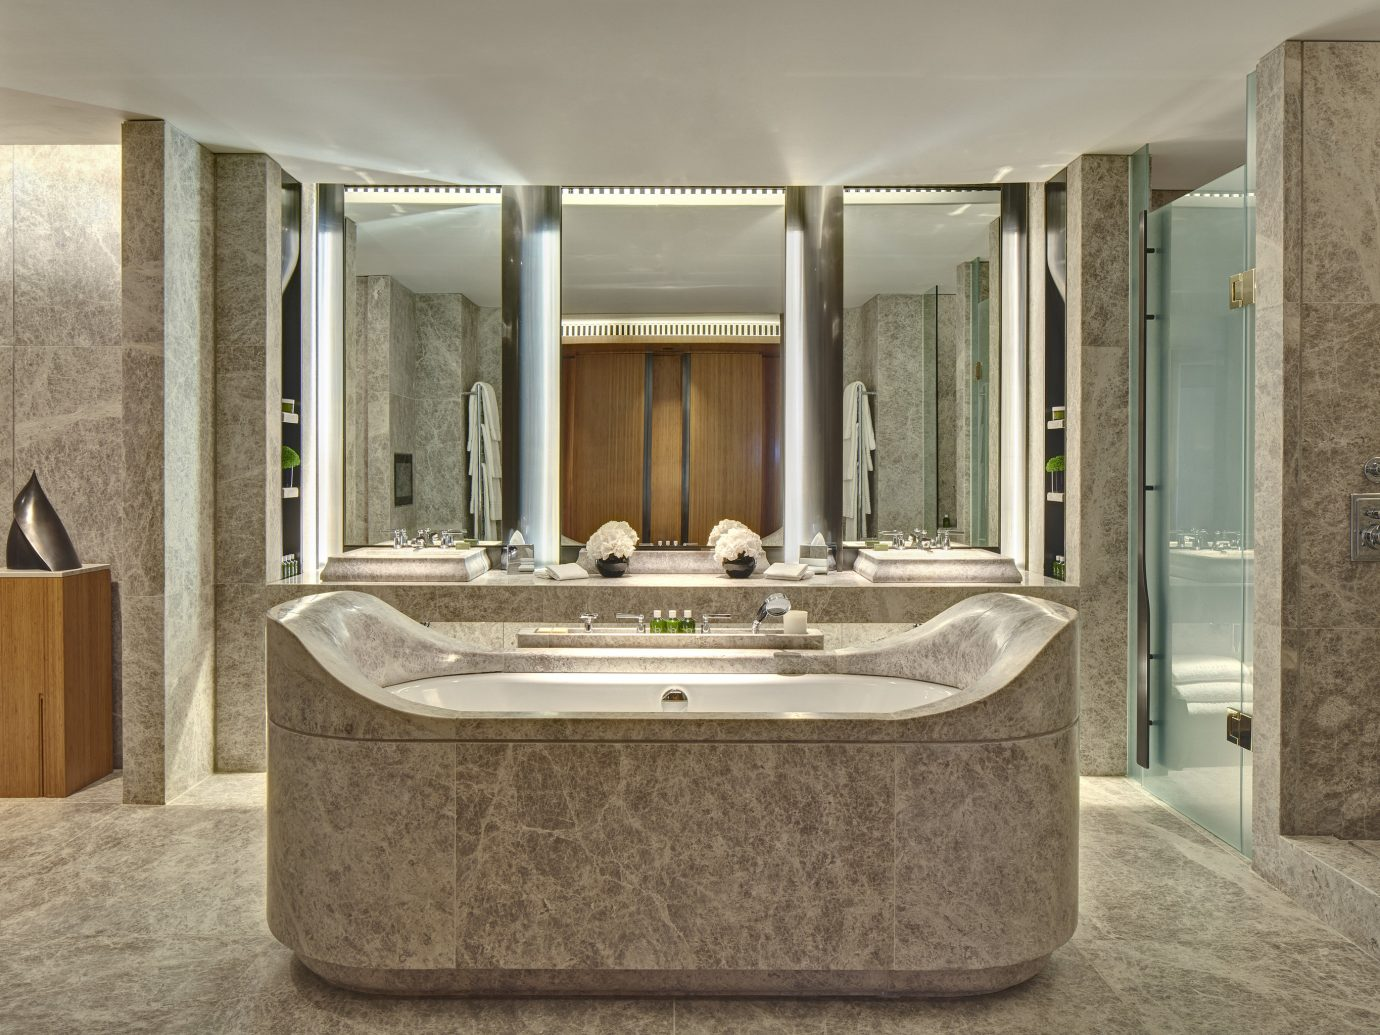 Hotels Luxury Travel bathroom indoor wall floor interior design estate tub bathtub real estate sink angle flooring stone interior designer Bath tan tiled